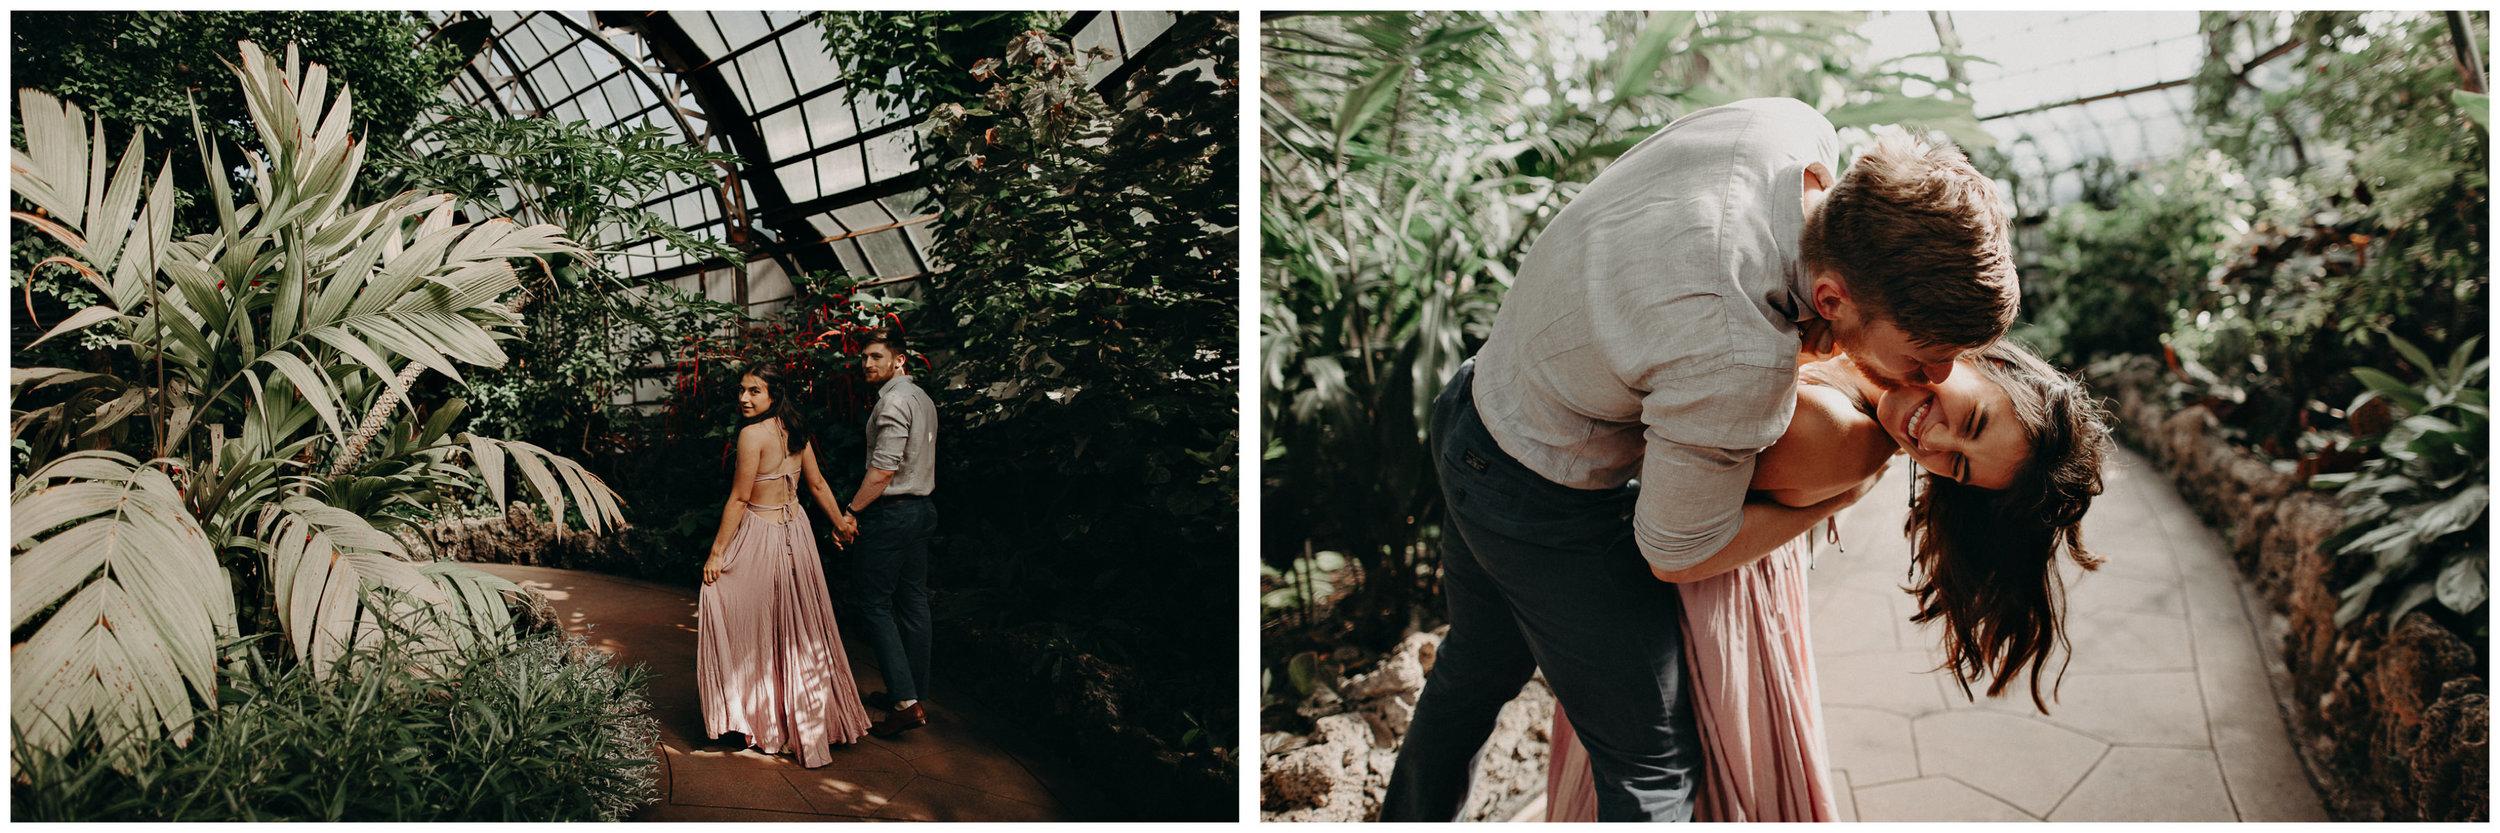 31- Chicago engagement wedding photographer - Aline Marin Photography.jpg